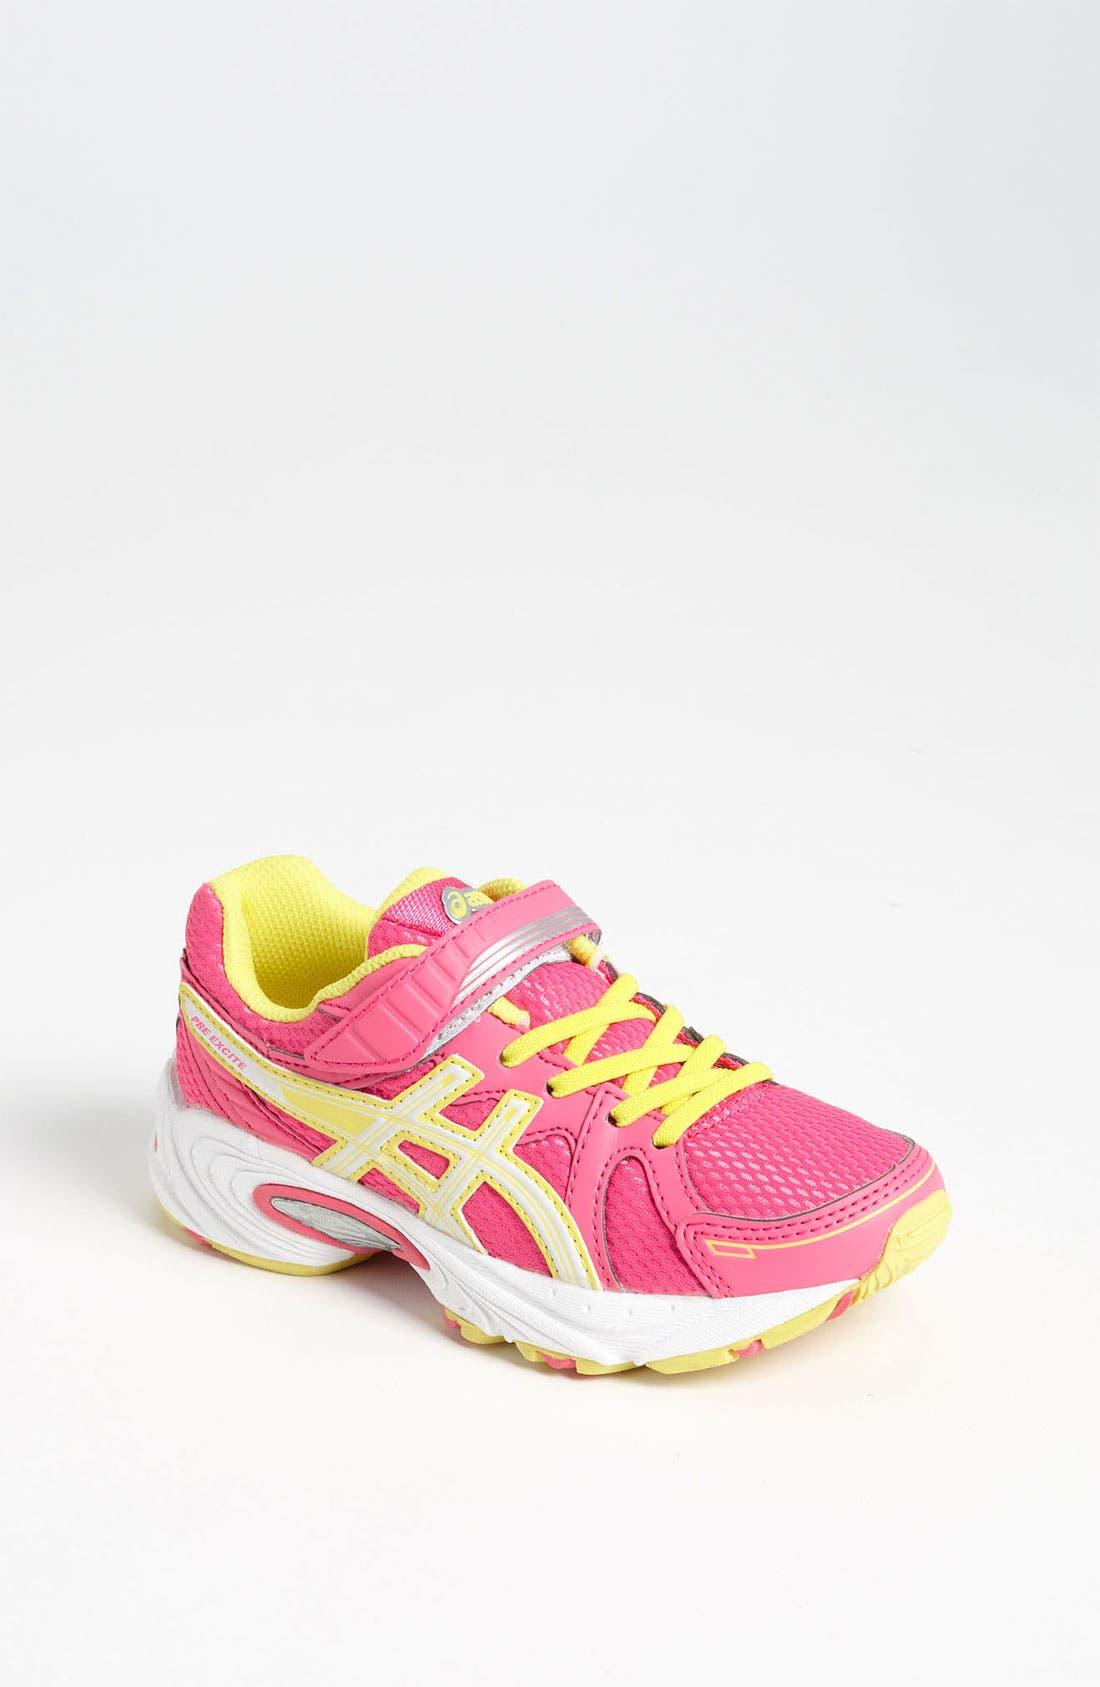 Alternate Image 1 Selected - ASICS® 'PRE-Excite™ PS' Sneaker (Toddler & Little Kid)